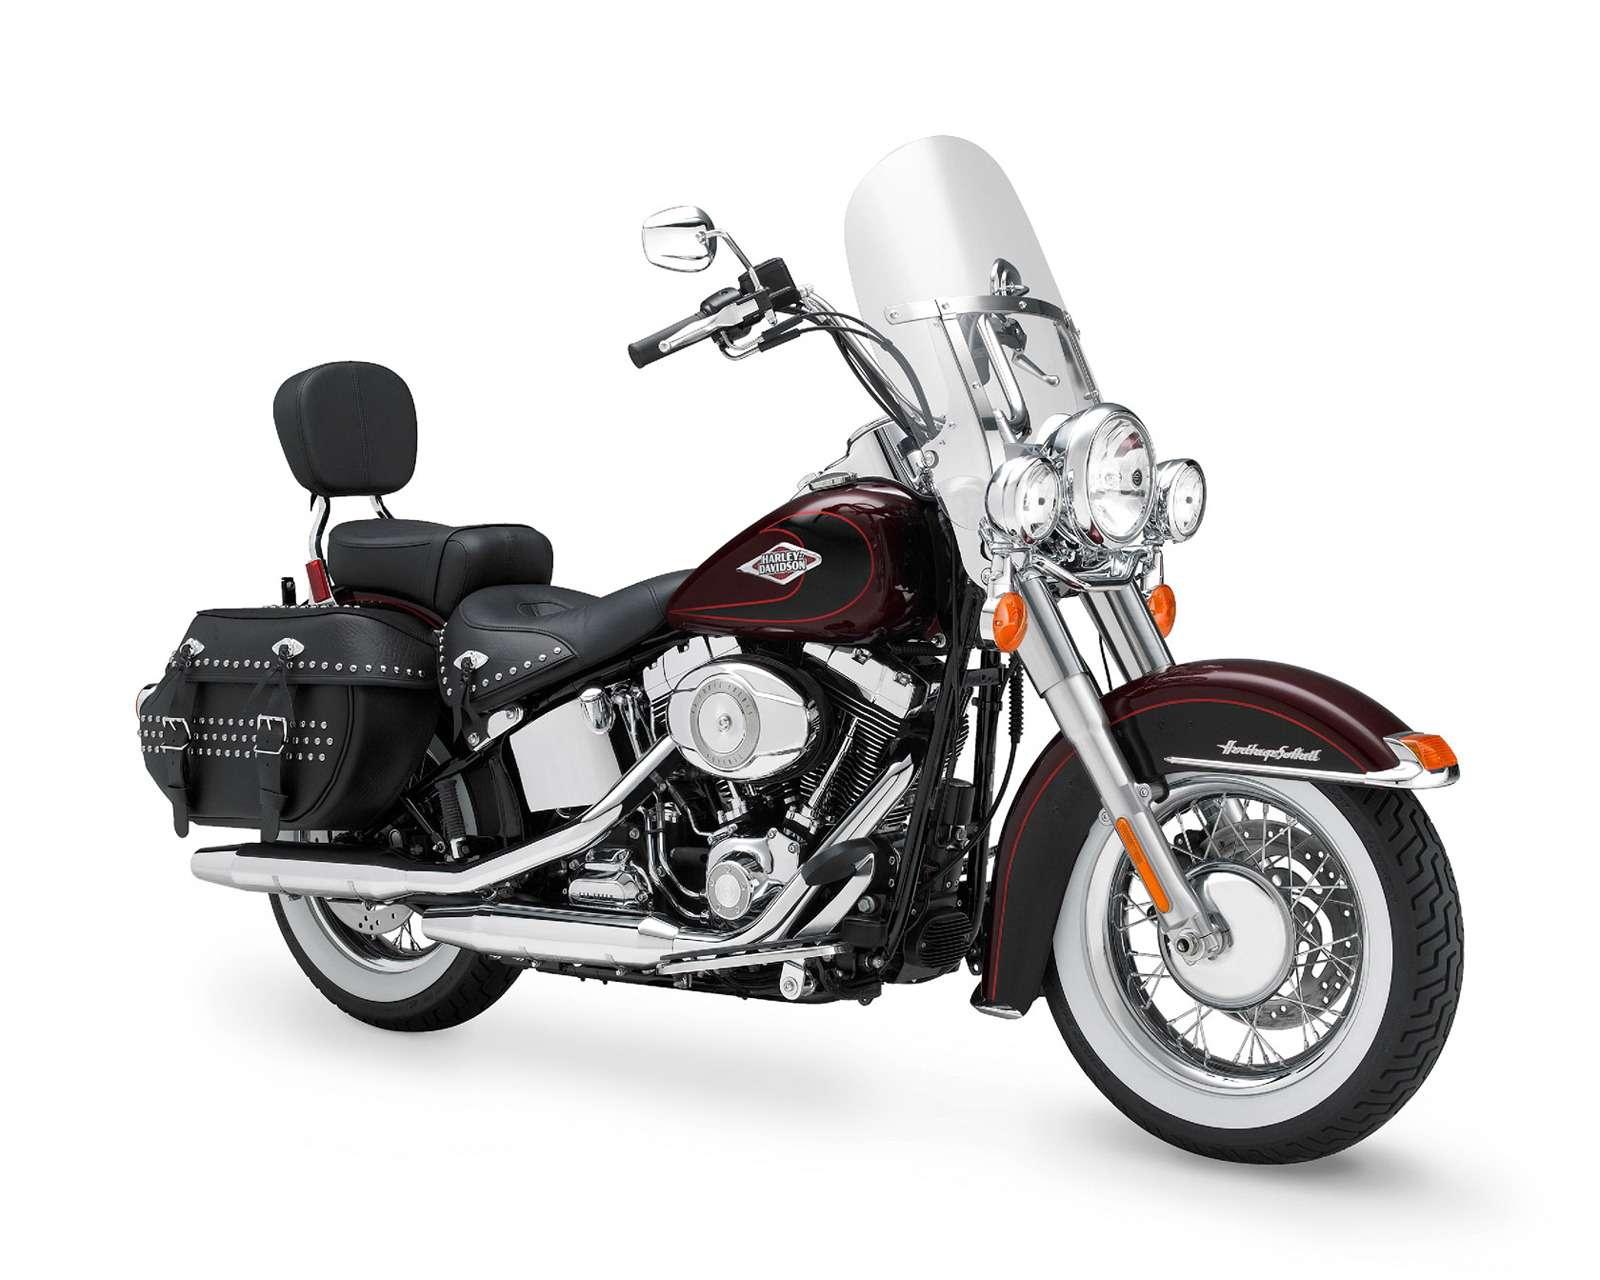 Harley-Davidson FLSTC 103